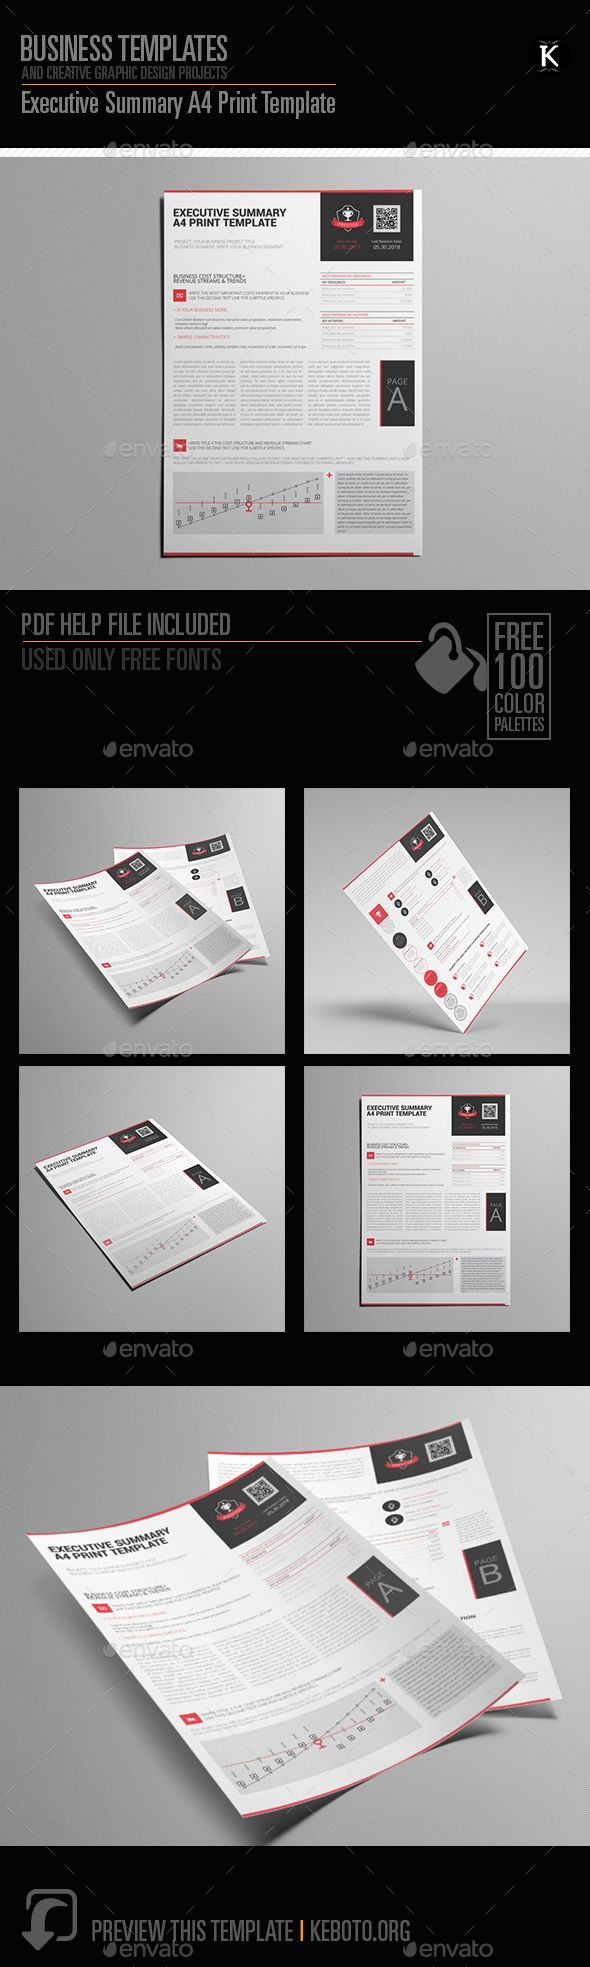 Executive Summary A4 Print Template